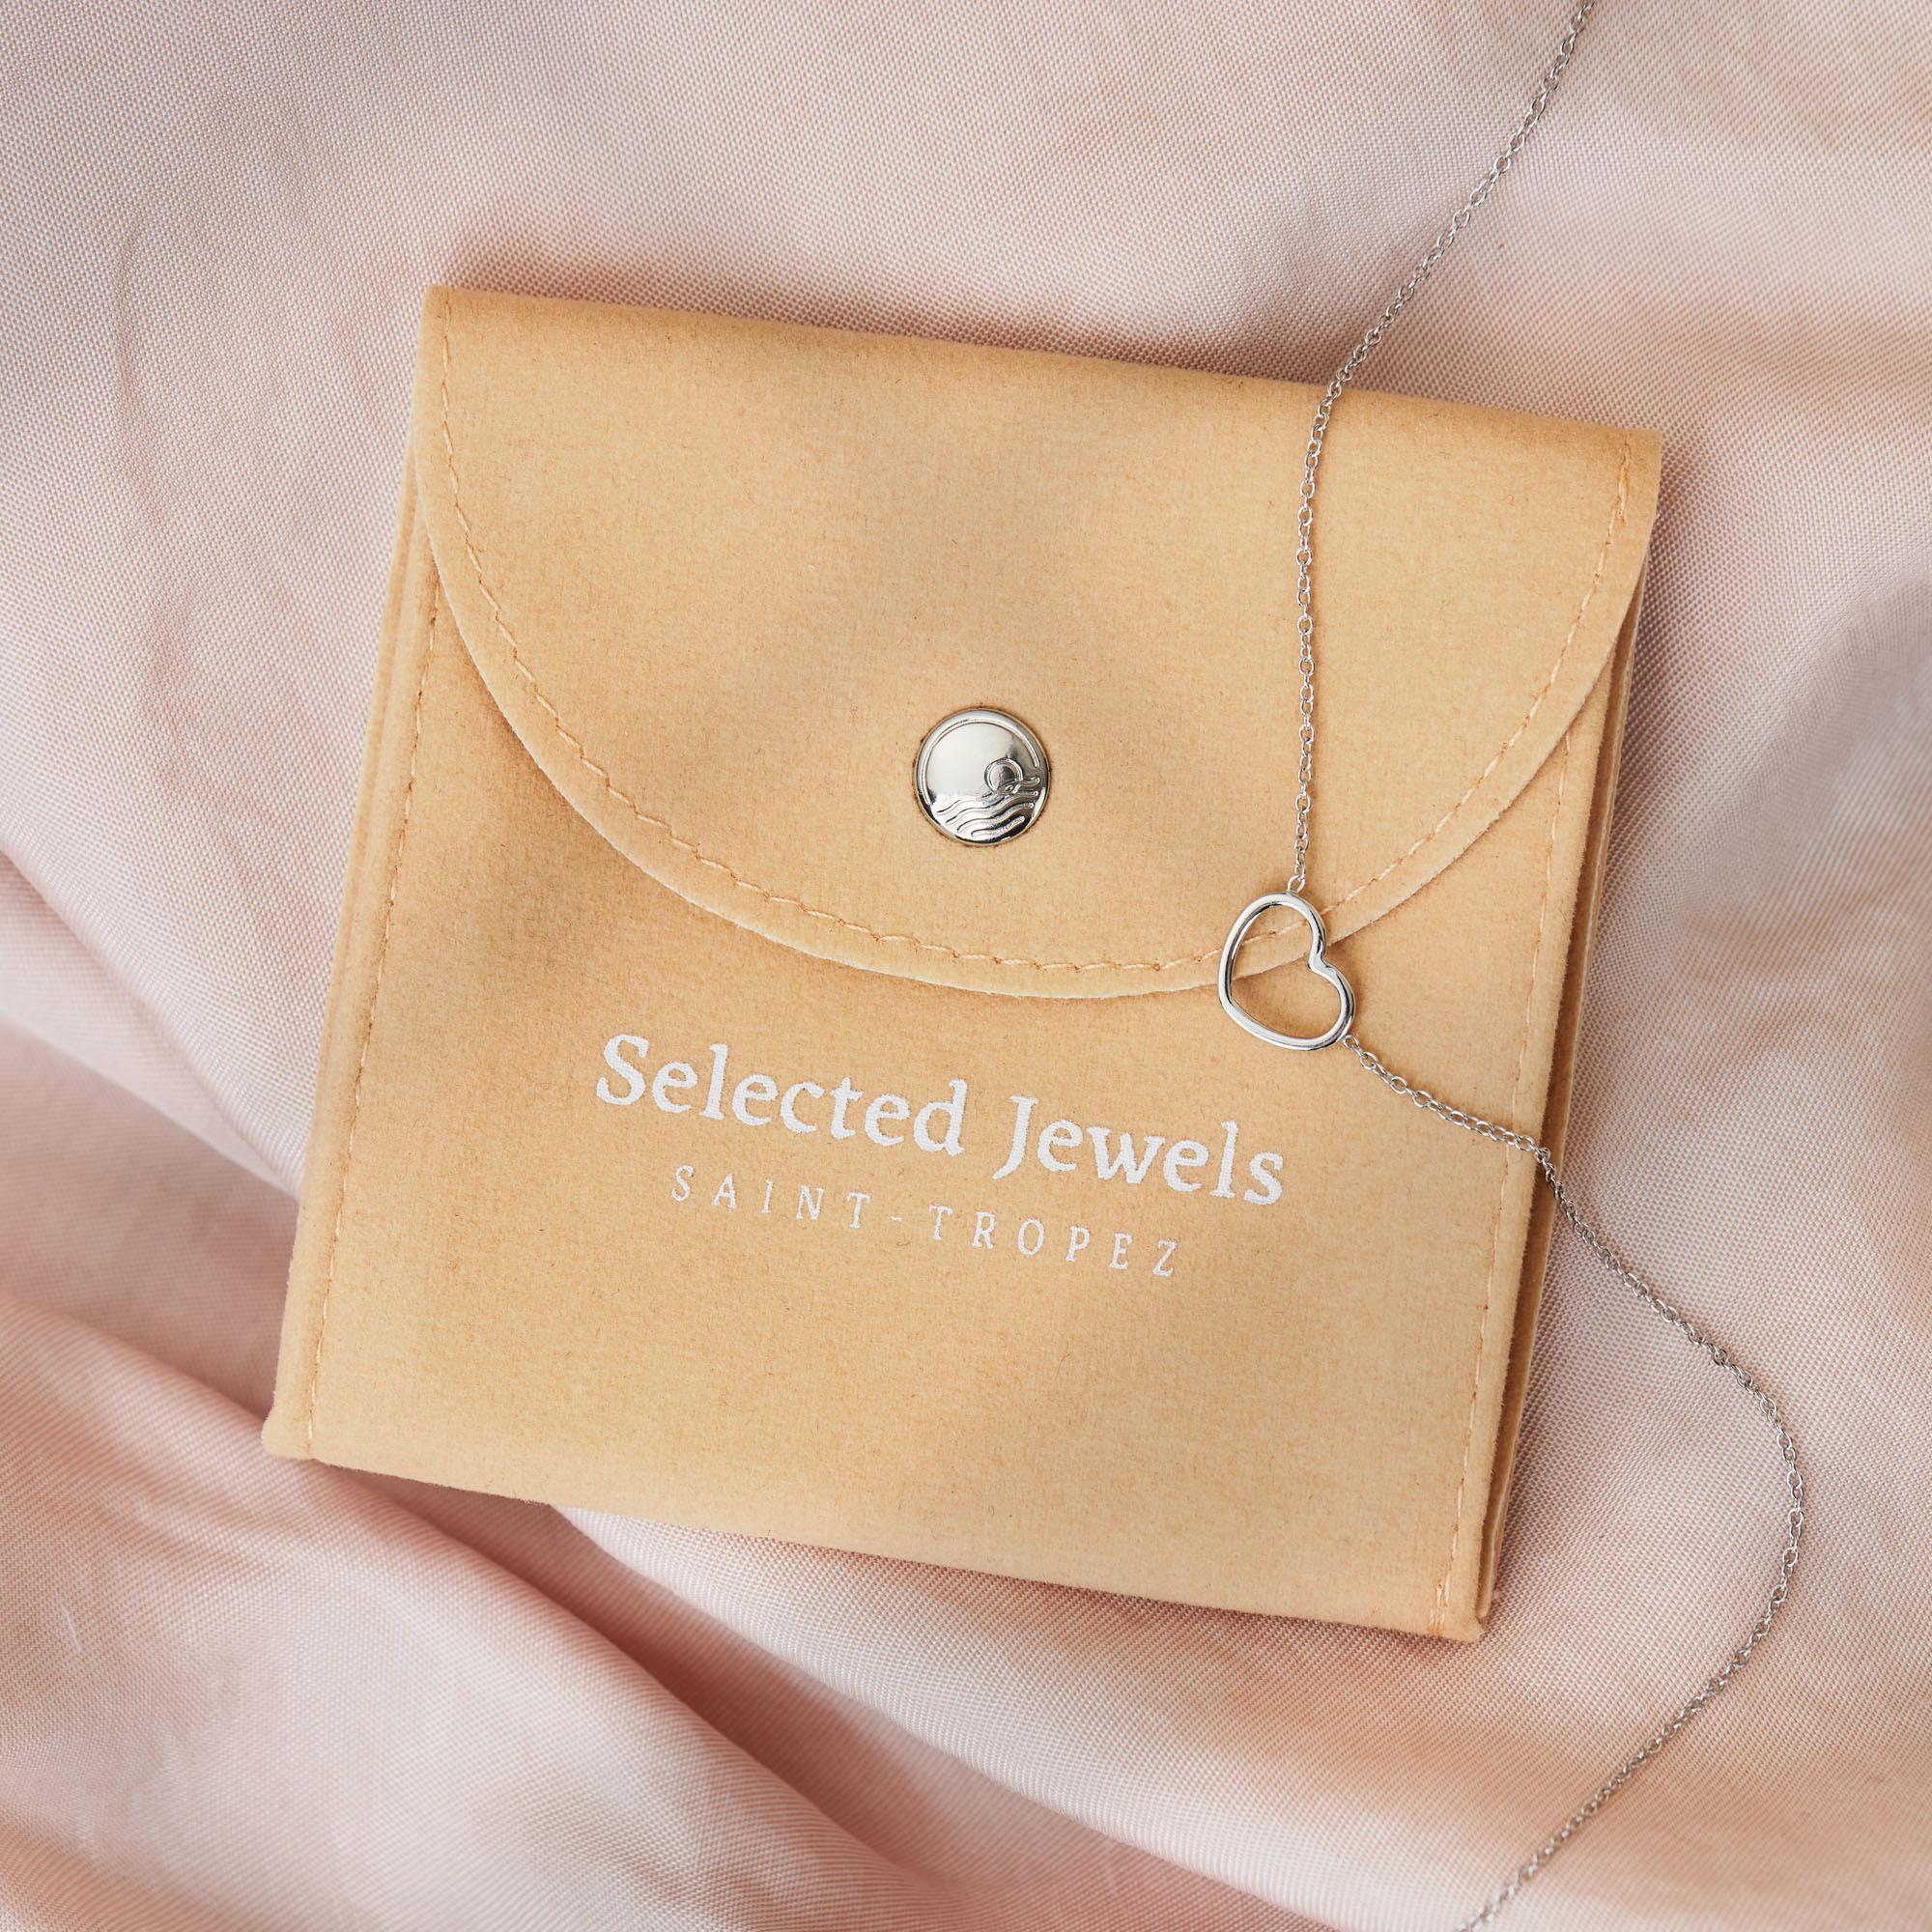 Selected Jewels Julie Théa 925 sterling silver guldfärgad creoler